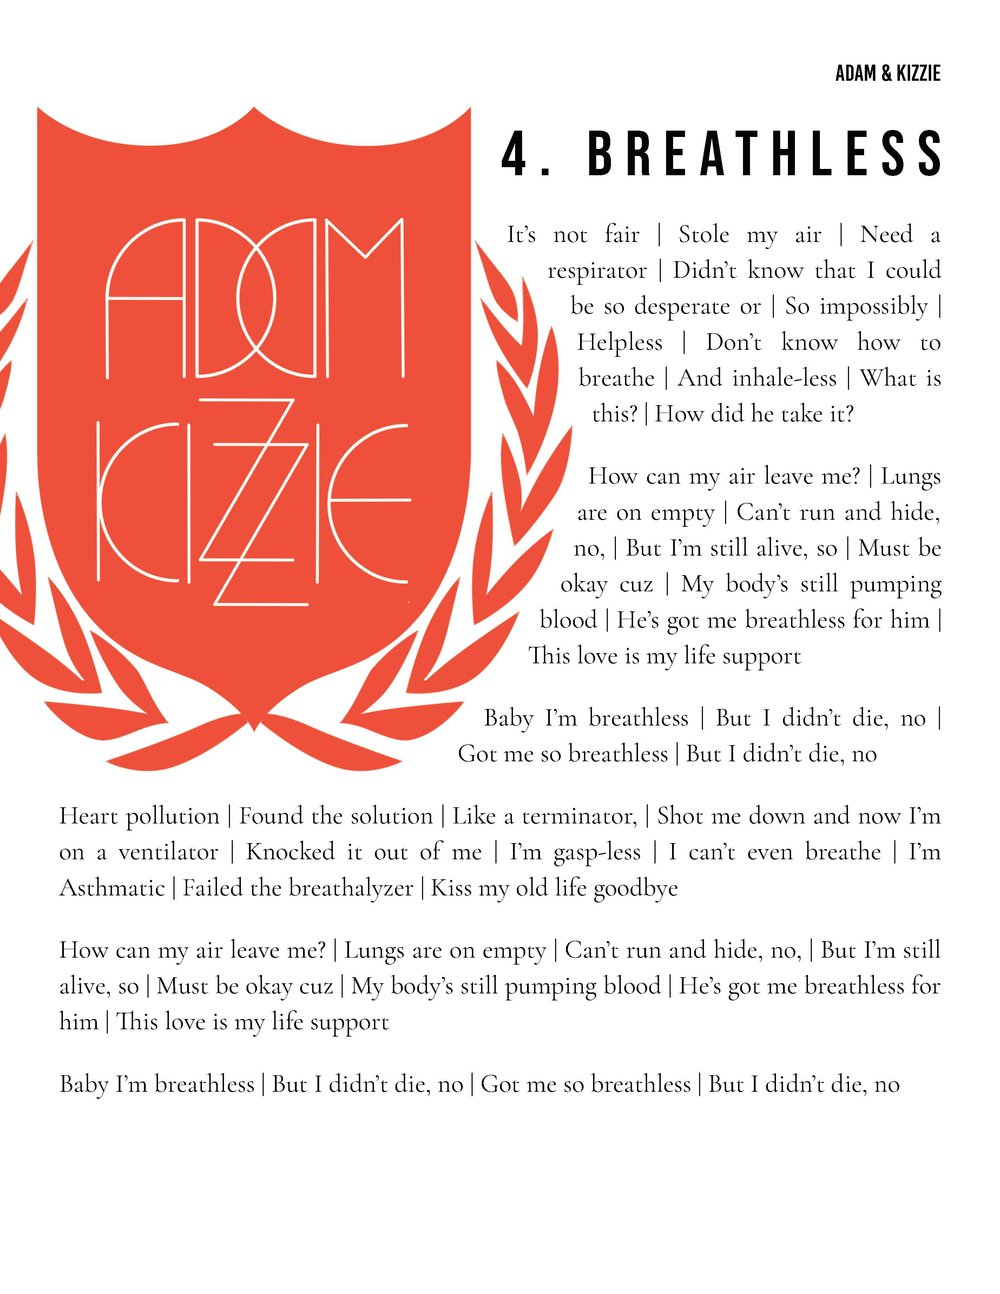 Breathless_Page_1.jpg